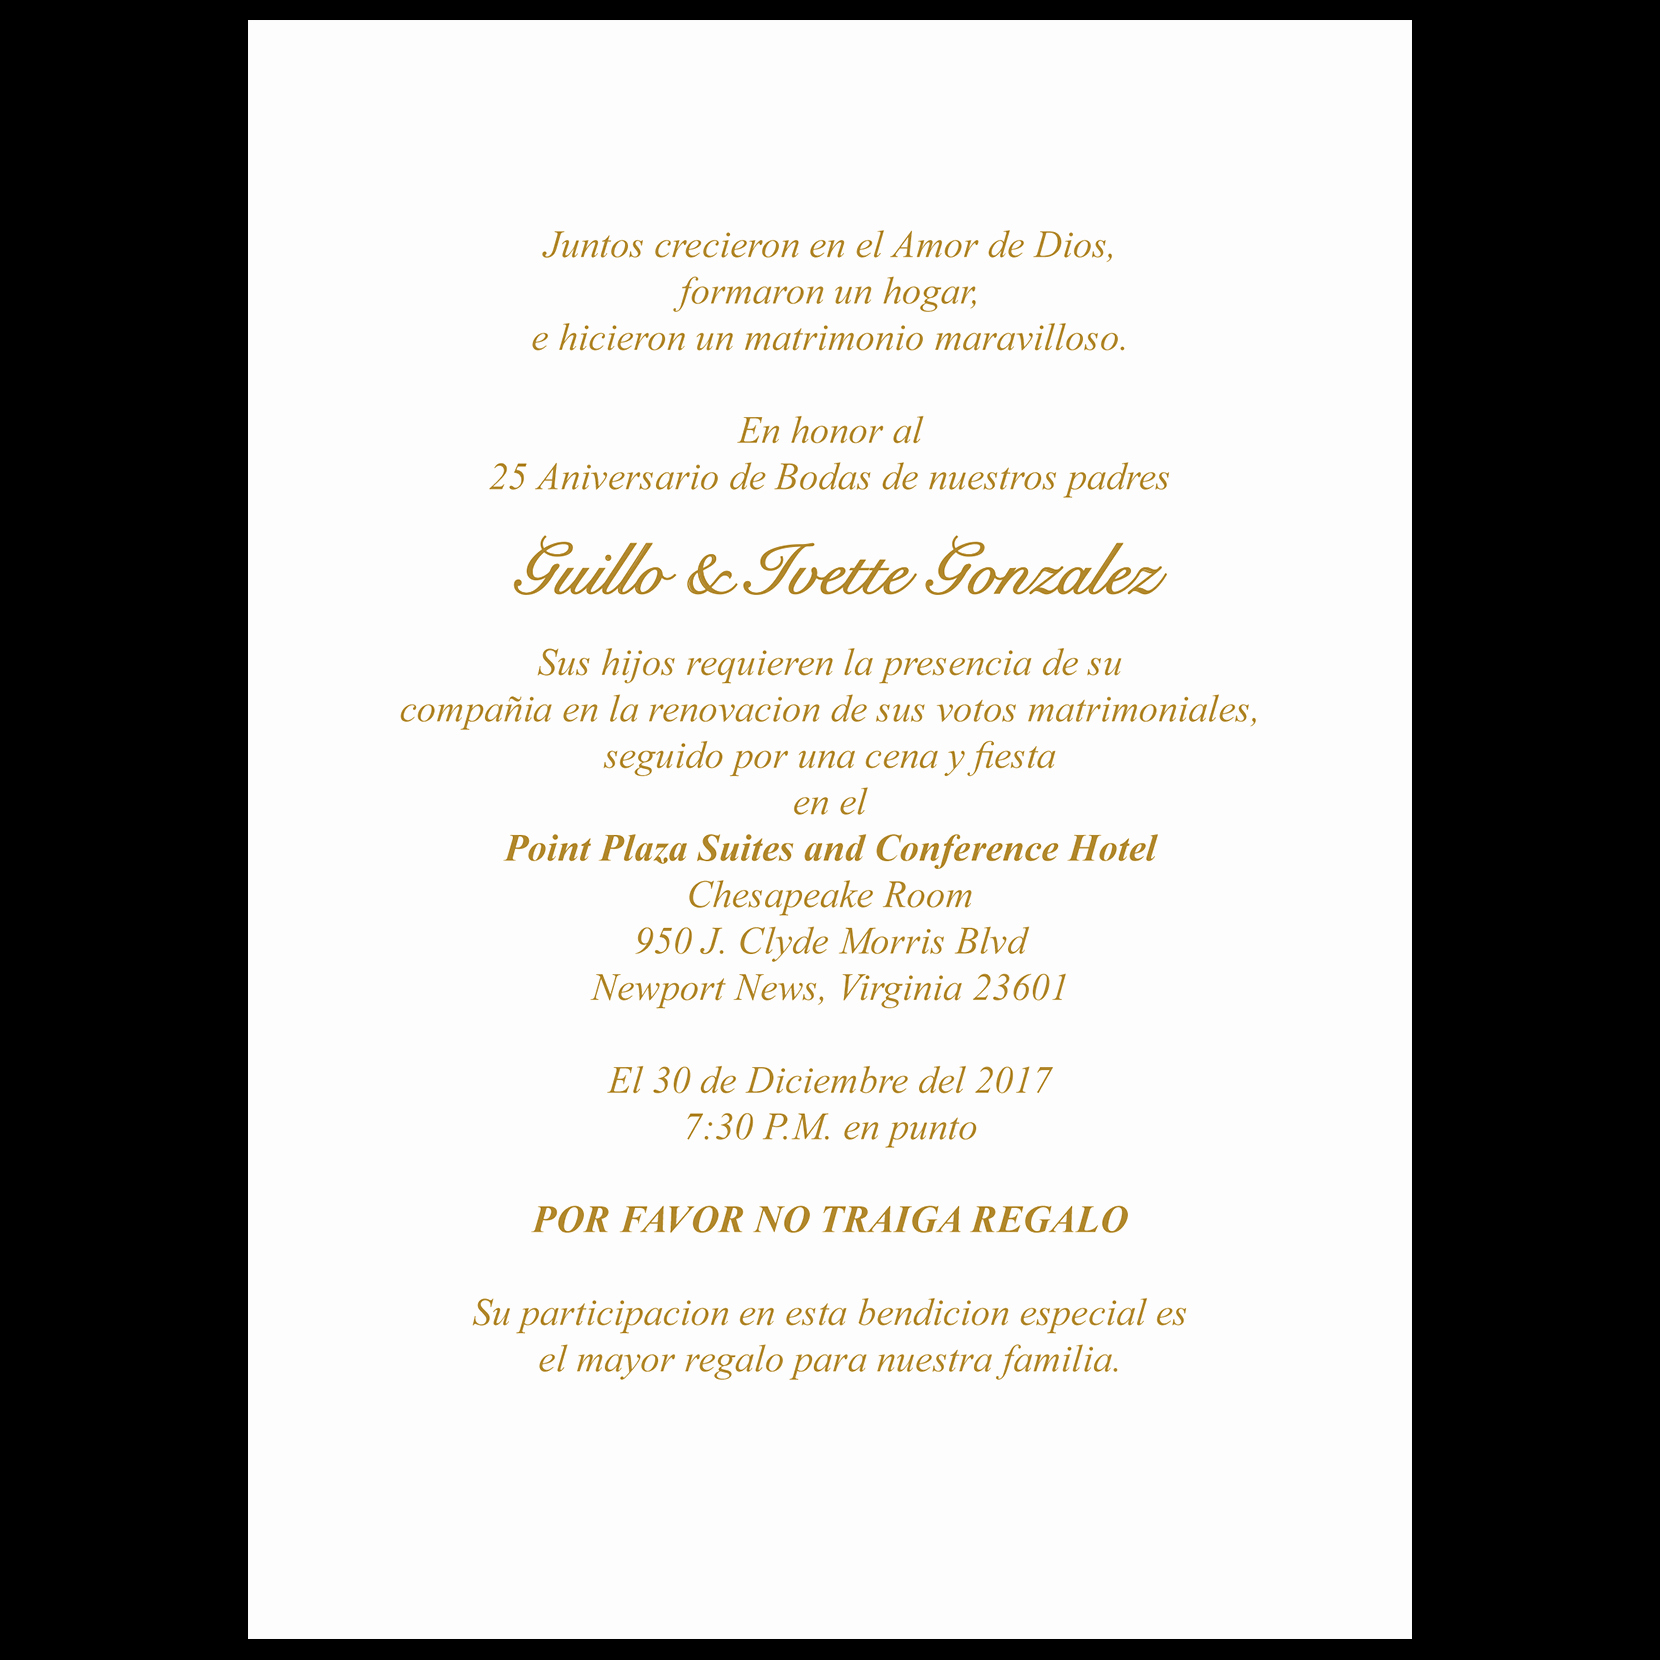 Wedding Invitation Wording In Spanish Inspirational 25th Anniversary Party Invitation Style 1s Spanish ⋆ Ipv